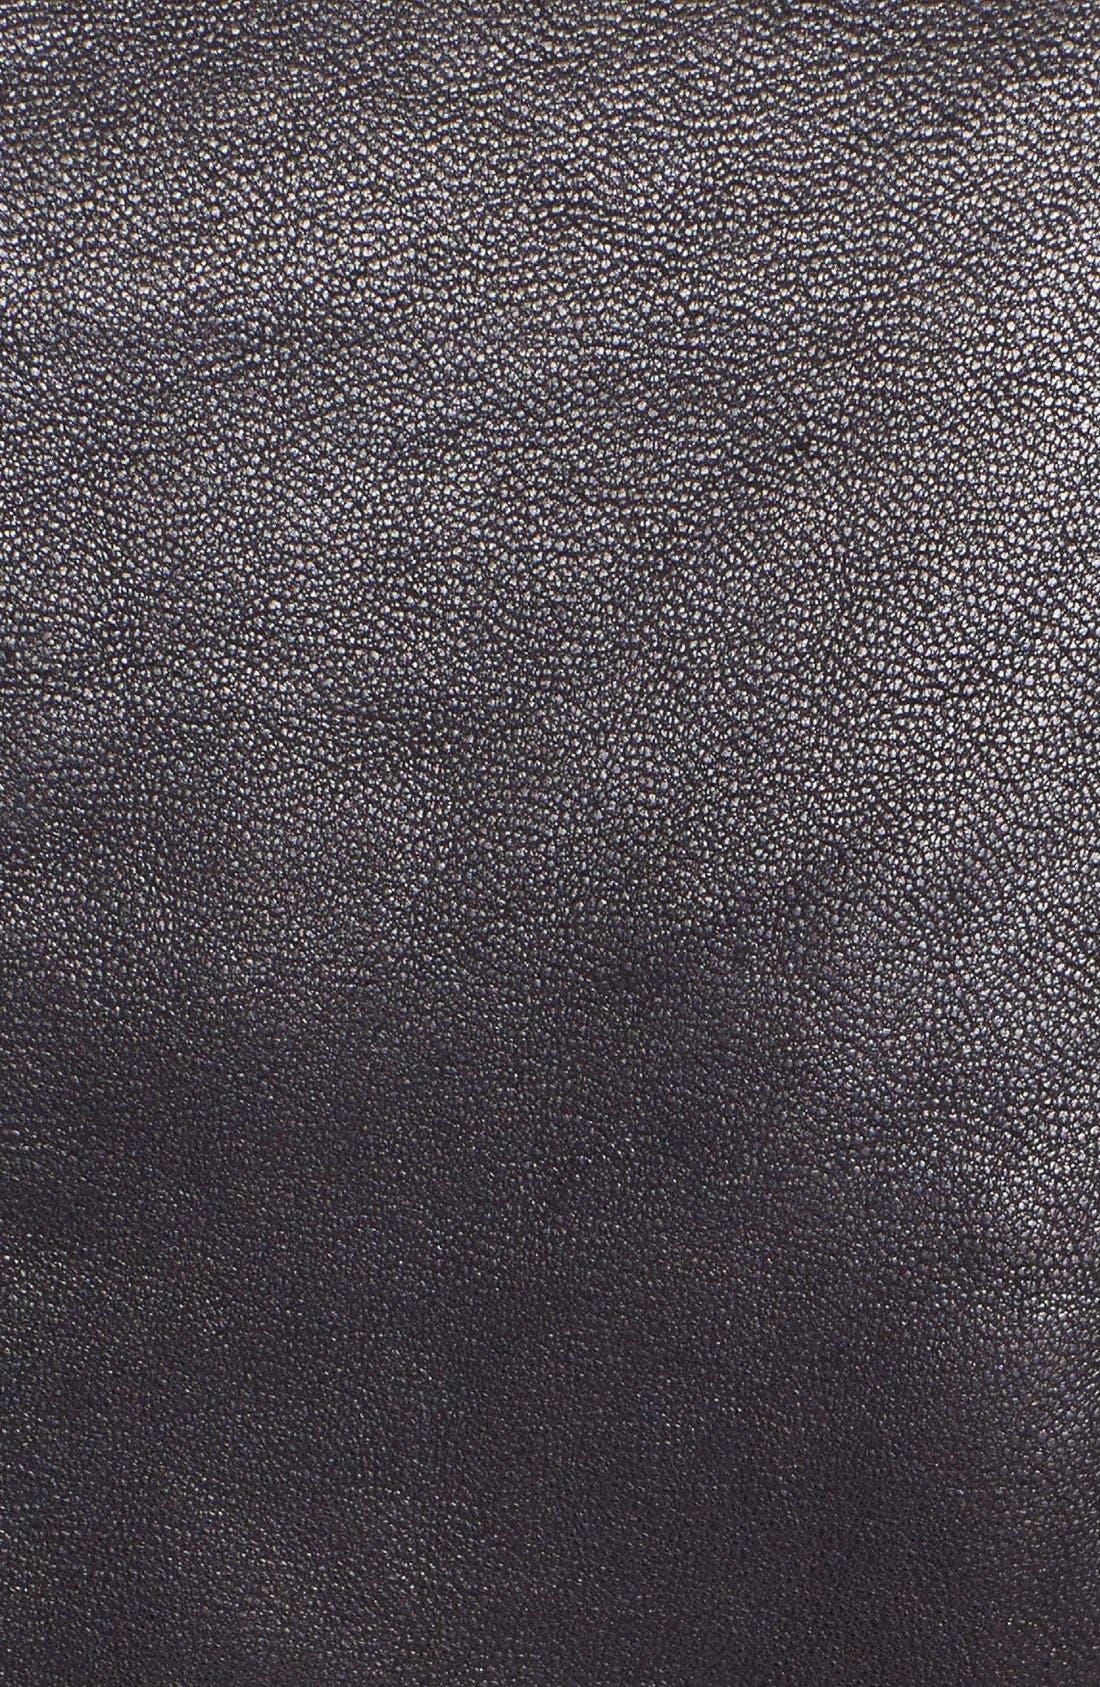 Alternate Image 3  - Sam Edelman Knit Collar Leather Jacket